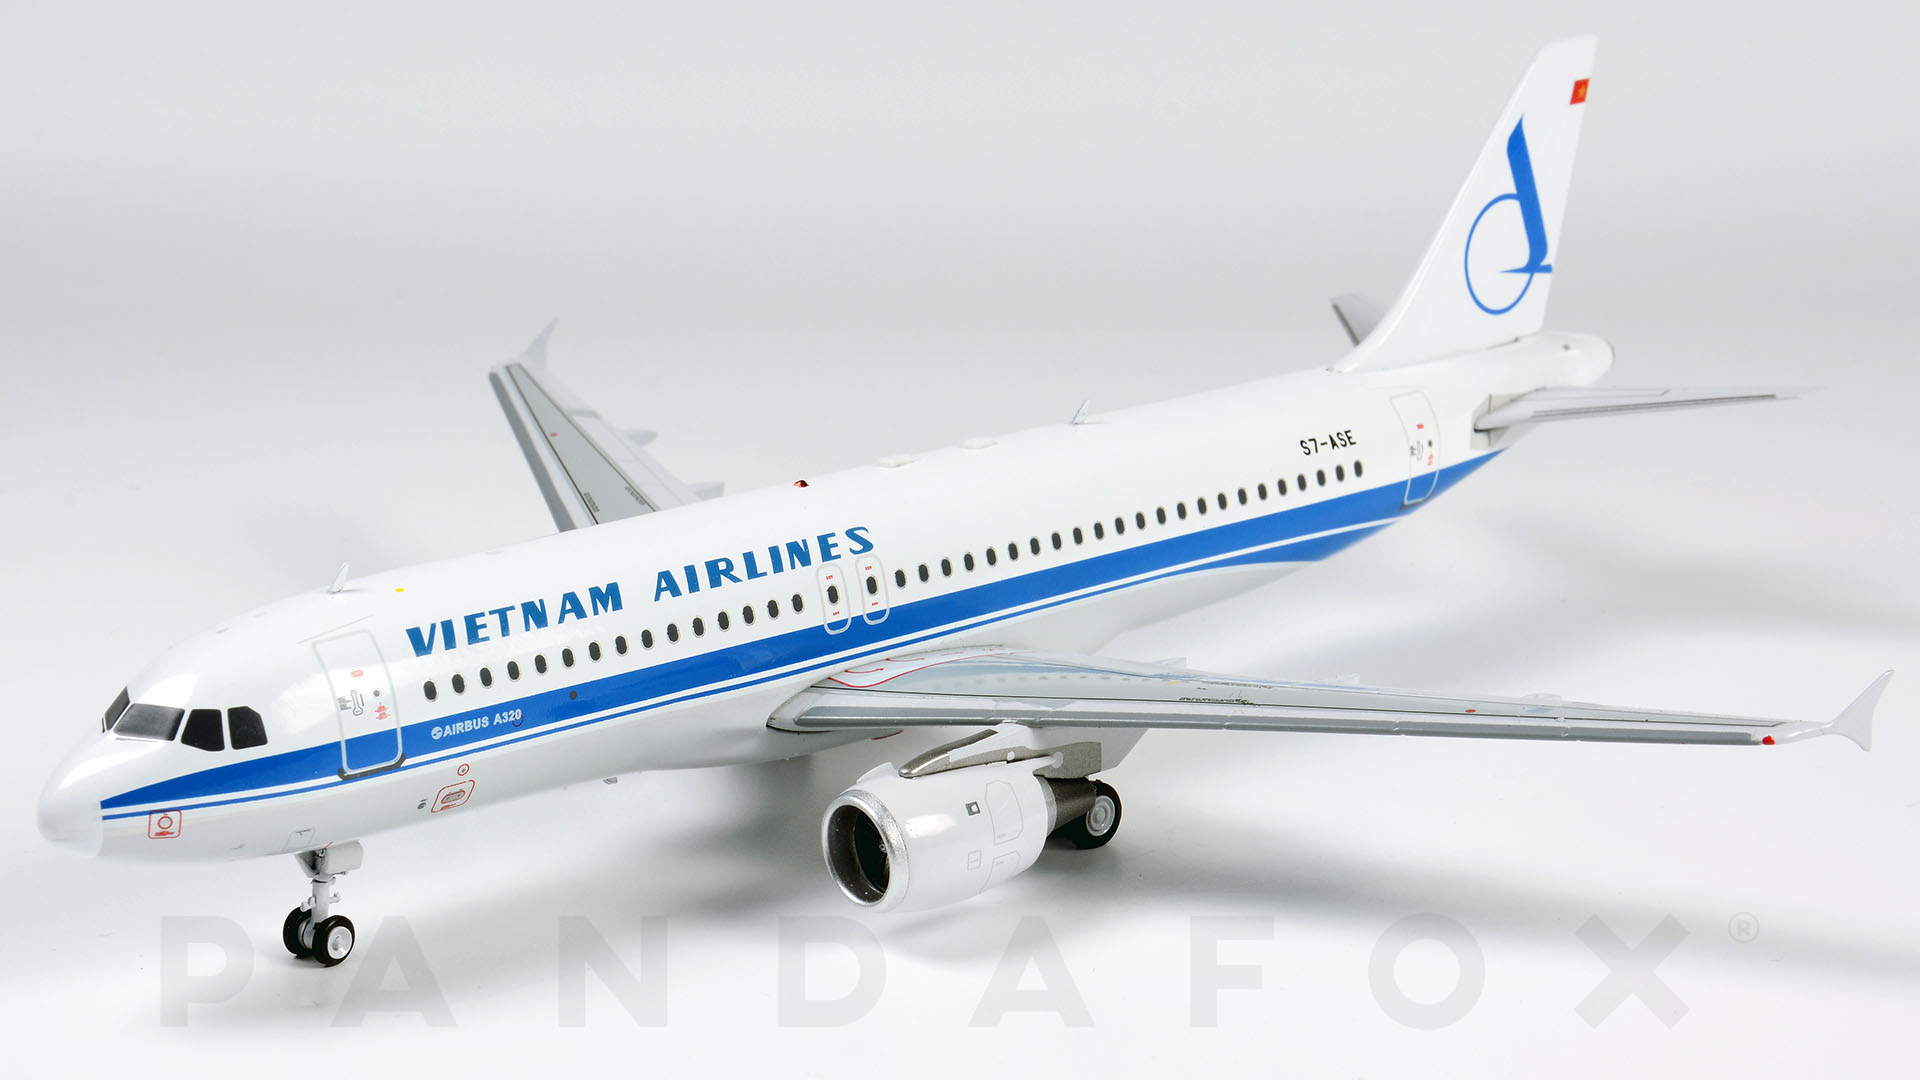 Mo Hinh May Bay Vietnam Airlines Airbus A320 S7 Ase Pandafox Toys Vietnam May Bay Mo Hinh Tĩnh